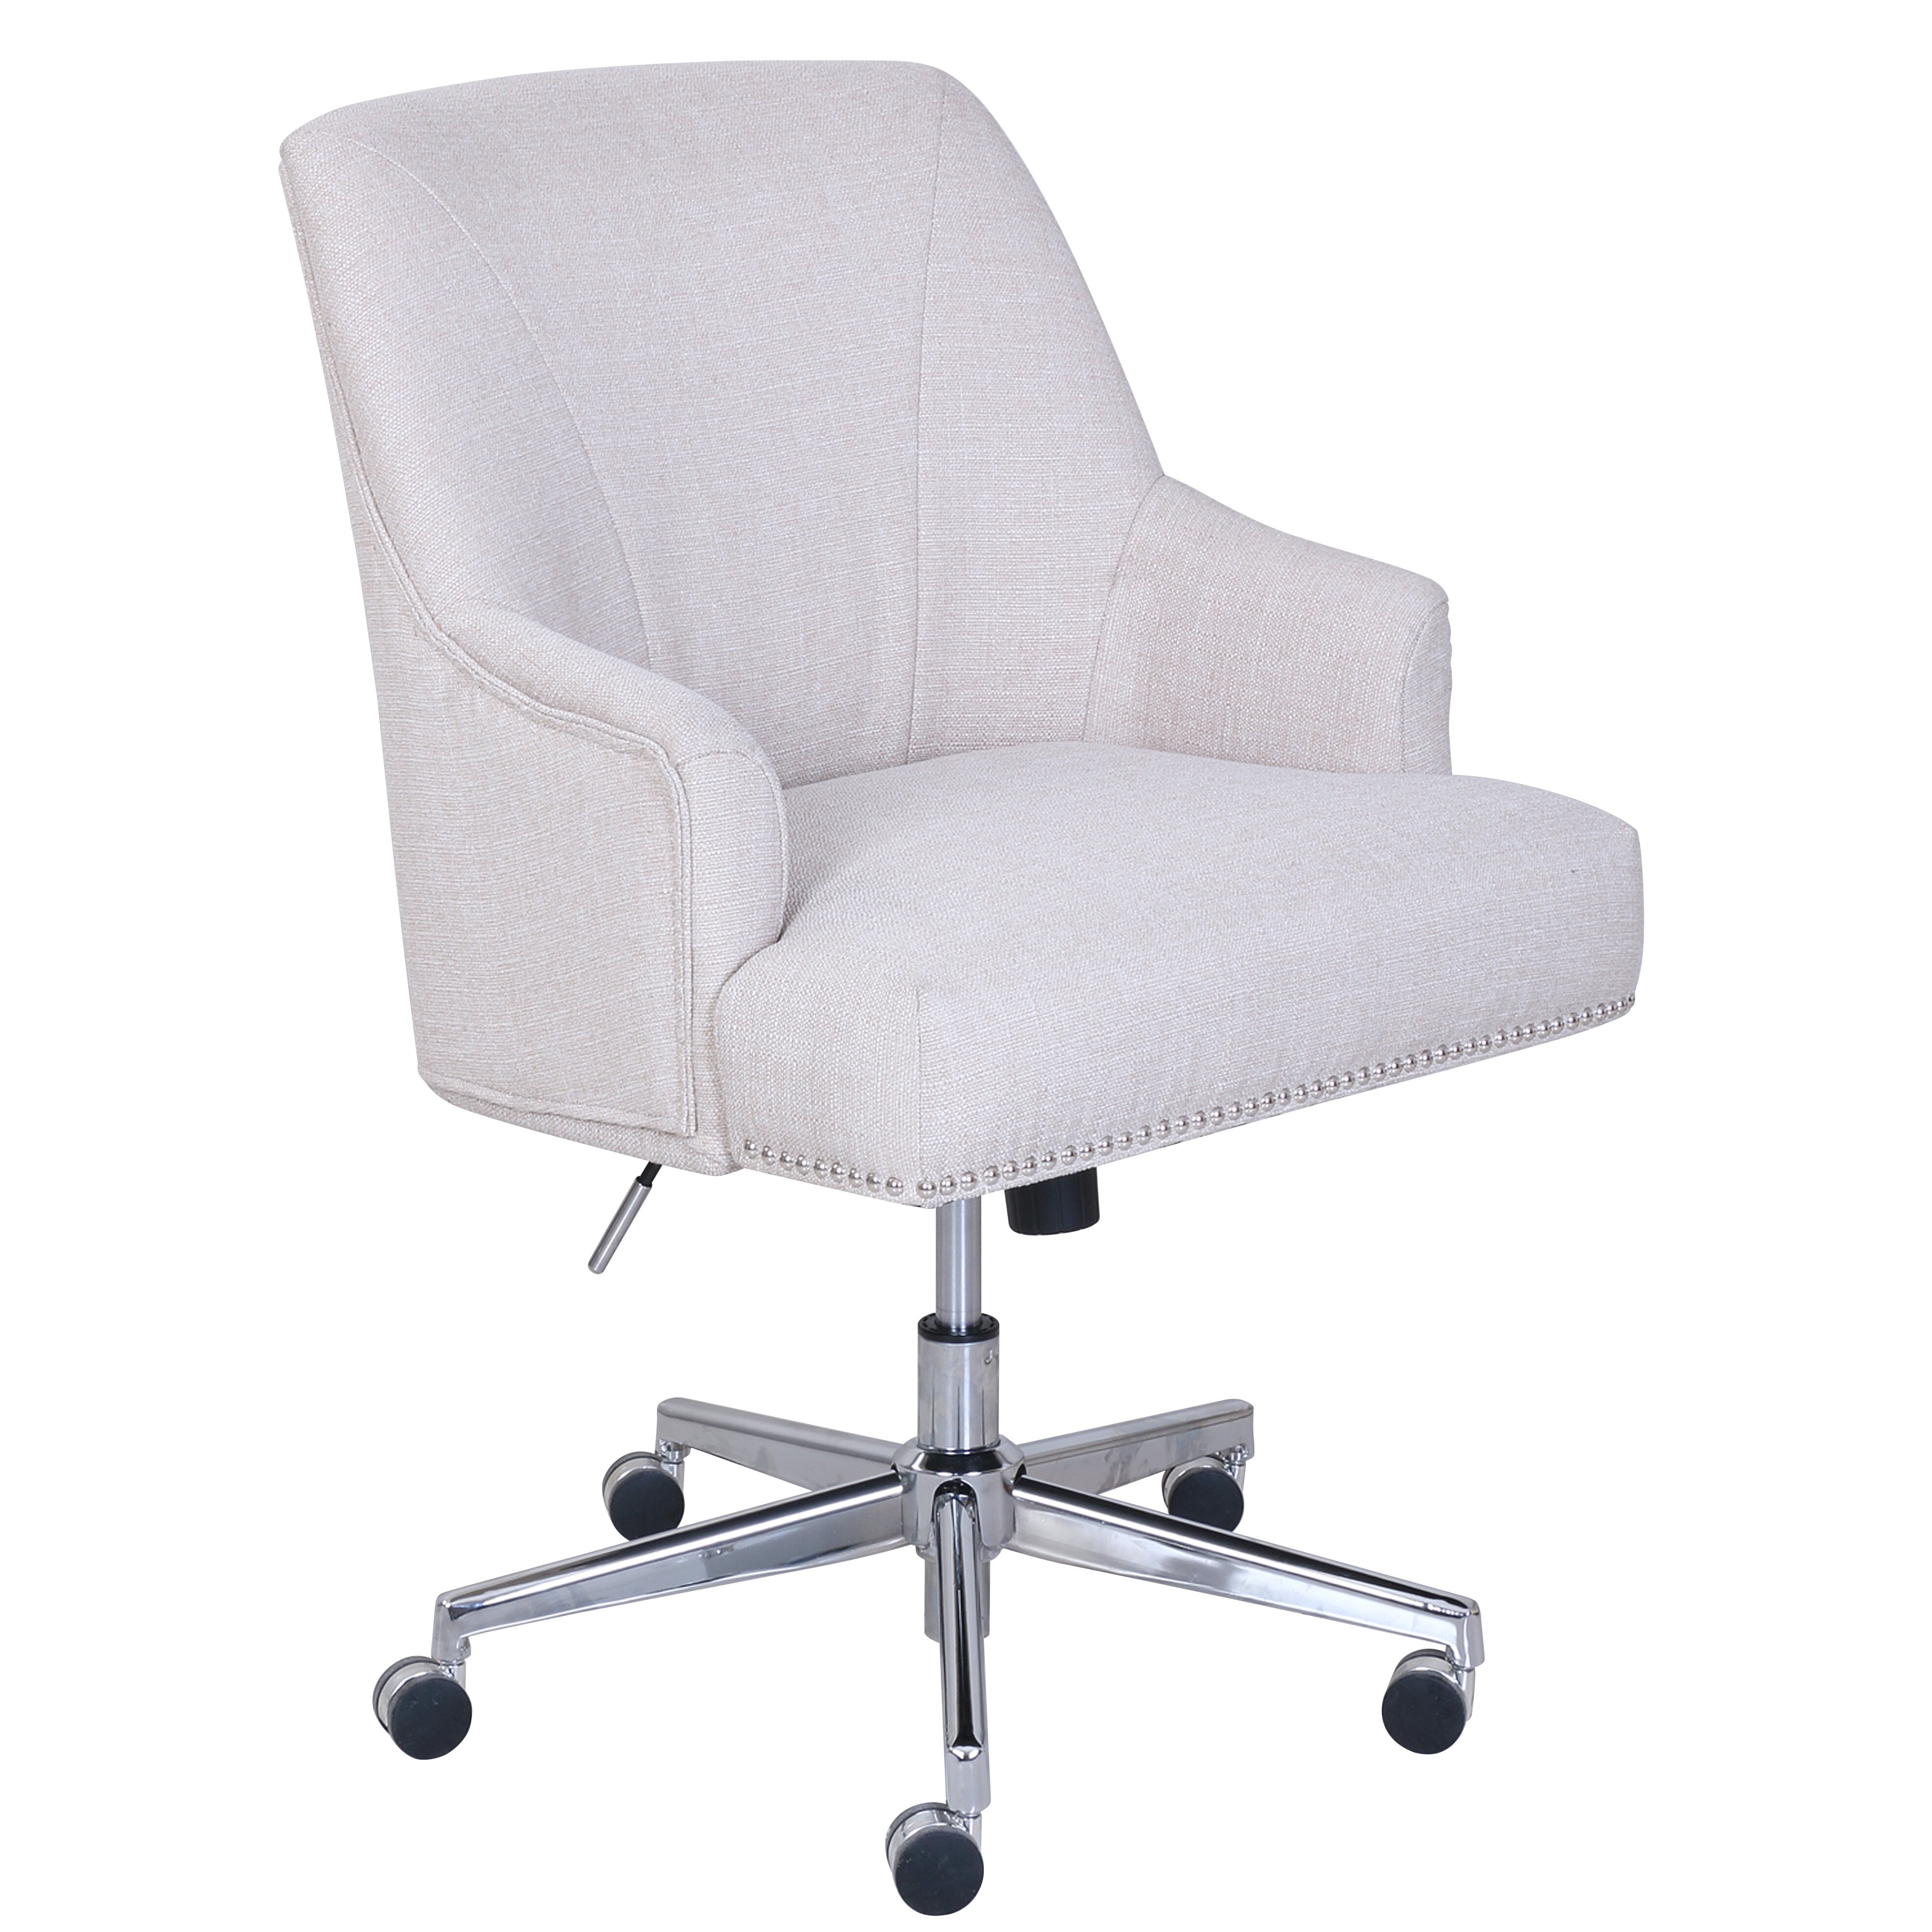 Serta At Home Serta Leighton Desk Chair Reviews Wayfair